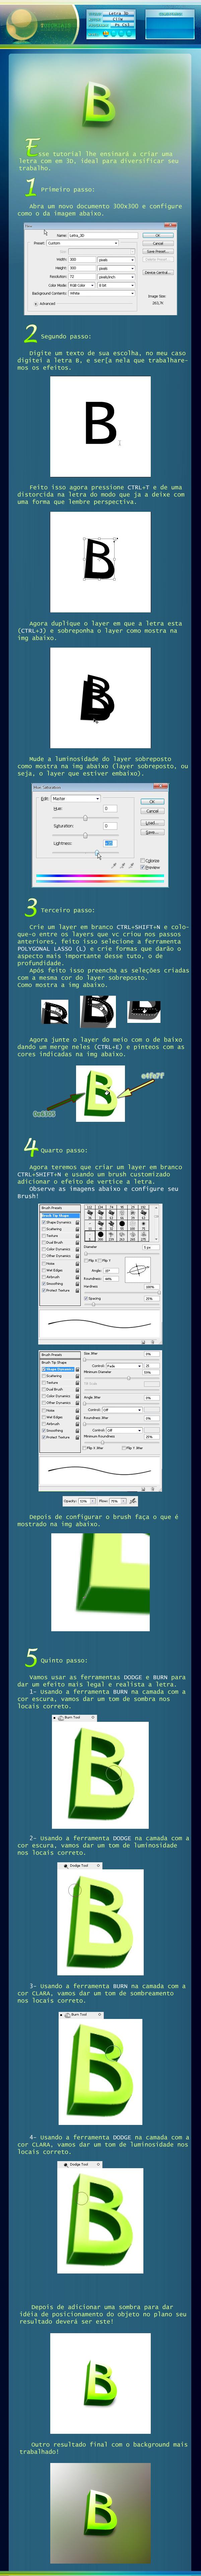 Efeito tipografia 3d Type_effect_by_gvbn10